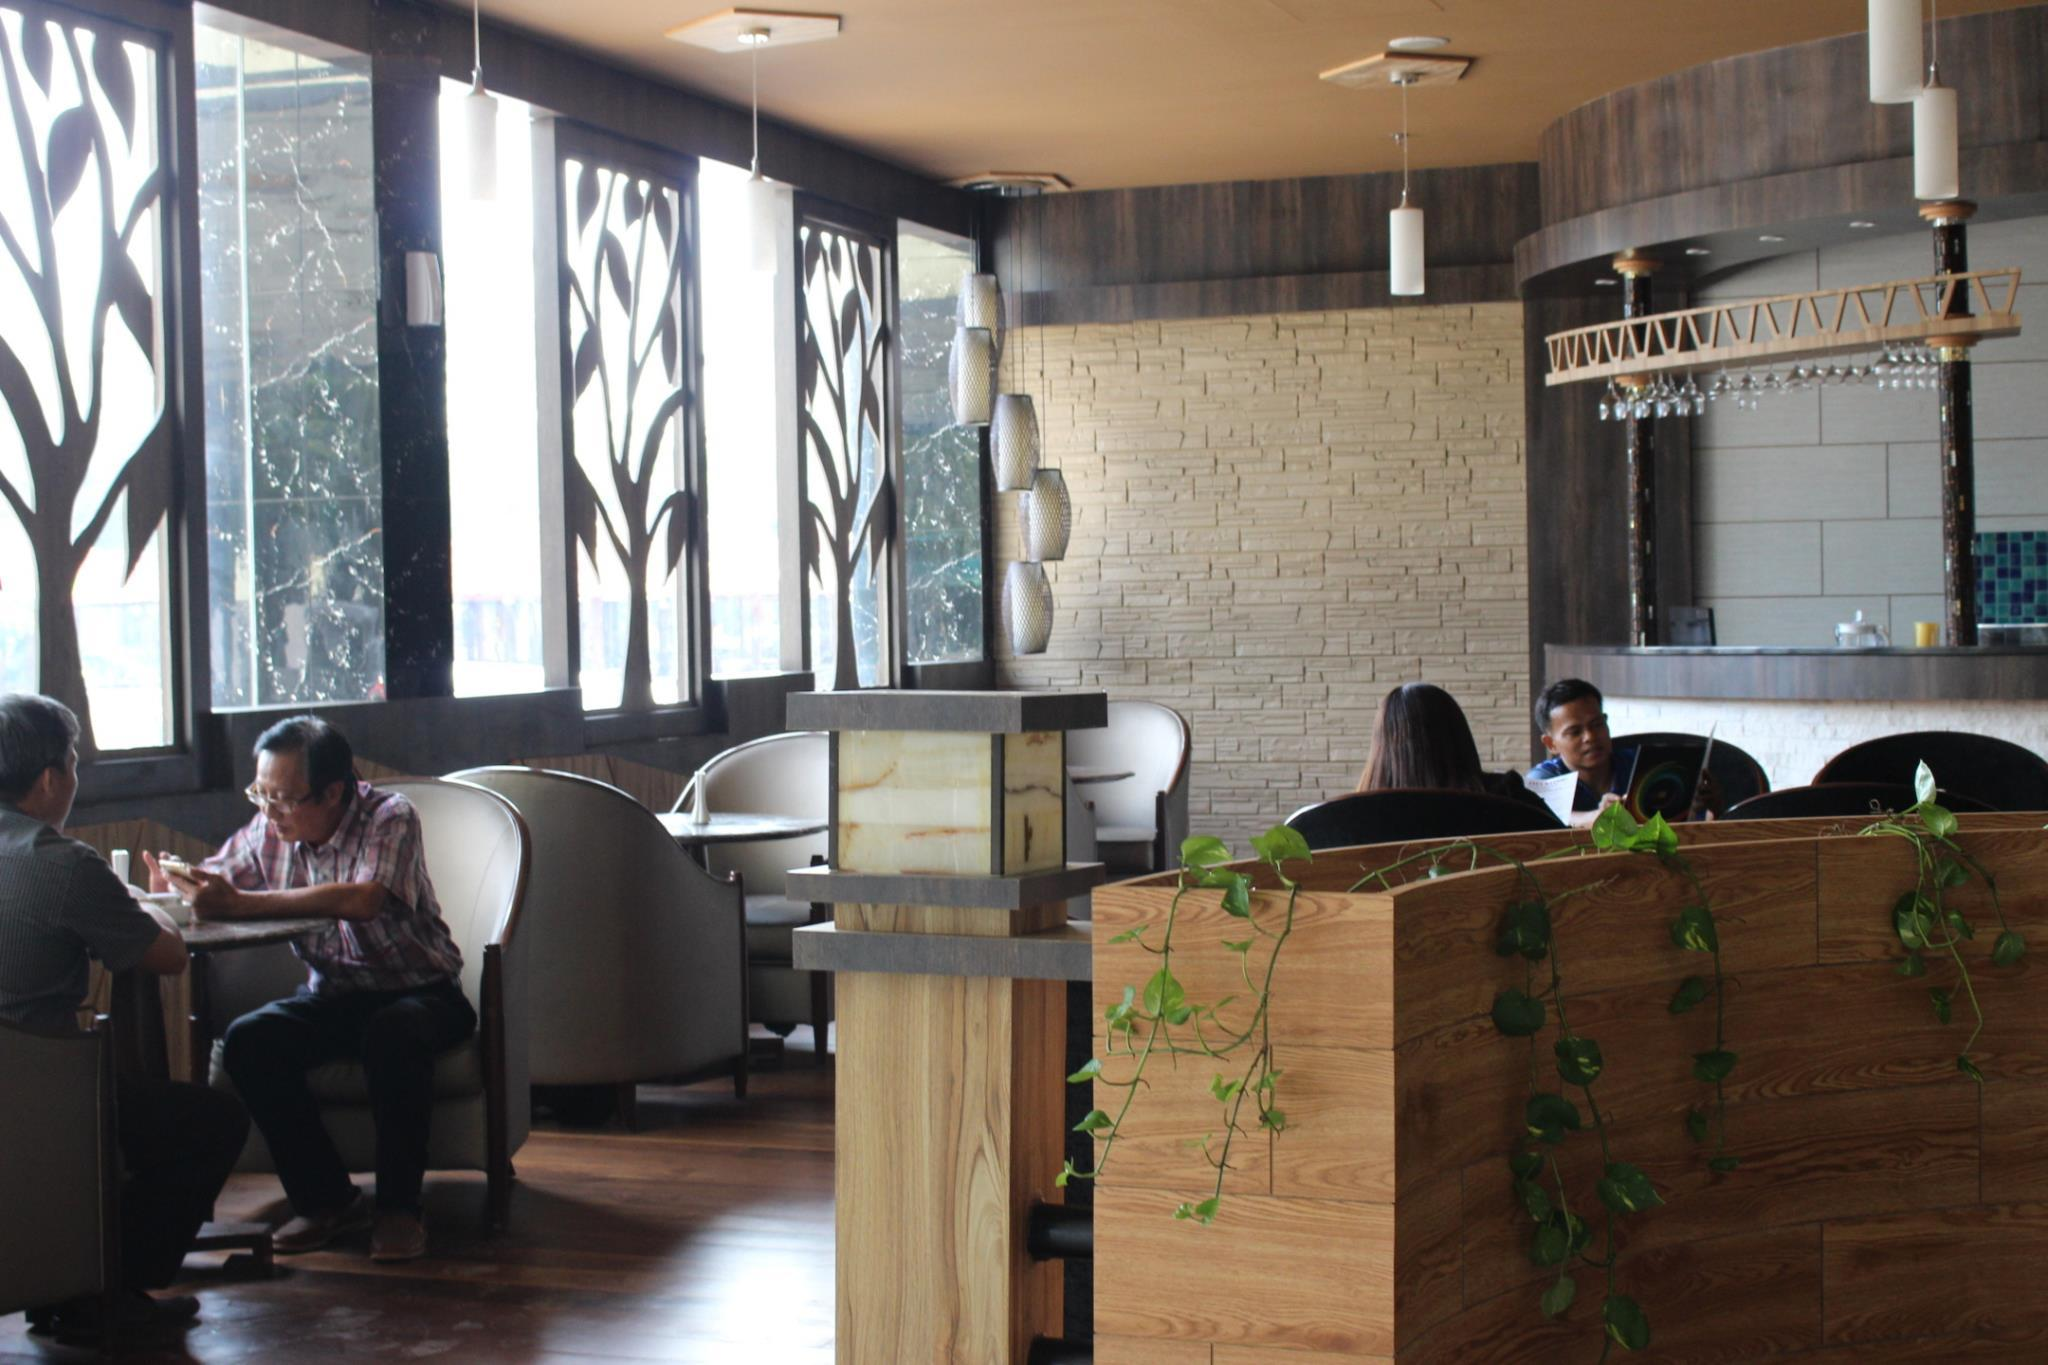 The Golden Bay Hotel Batam di Pulau Batam Kepulauan Riau Indonesia